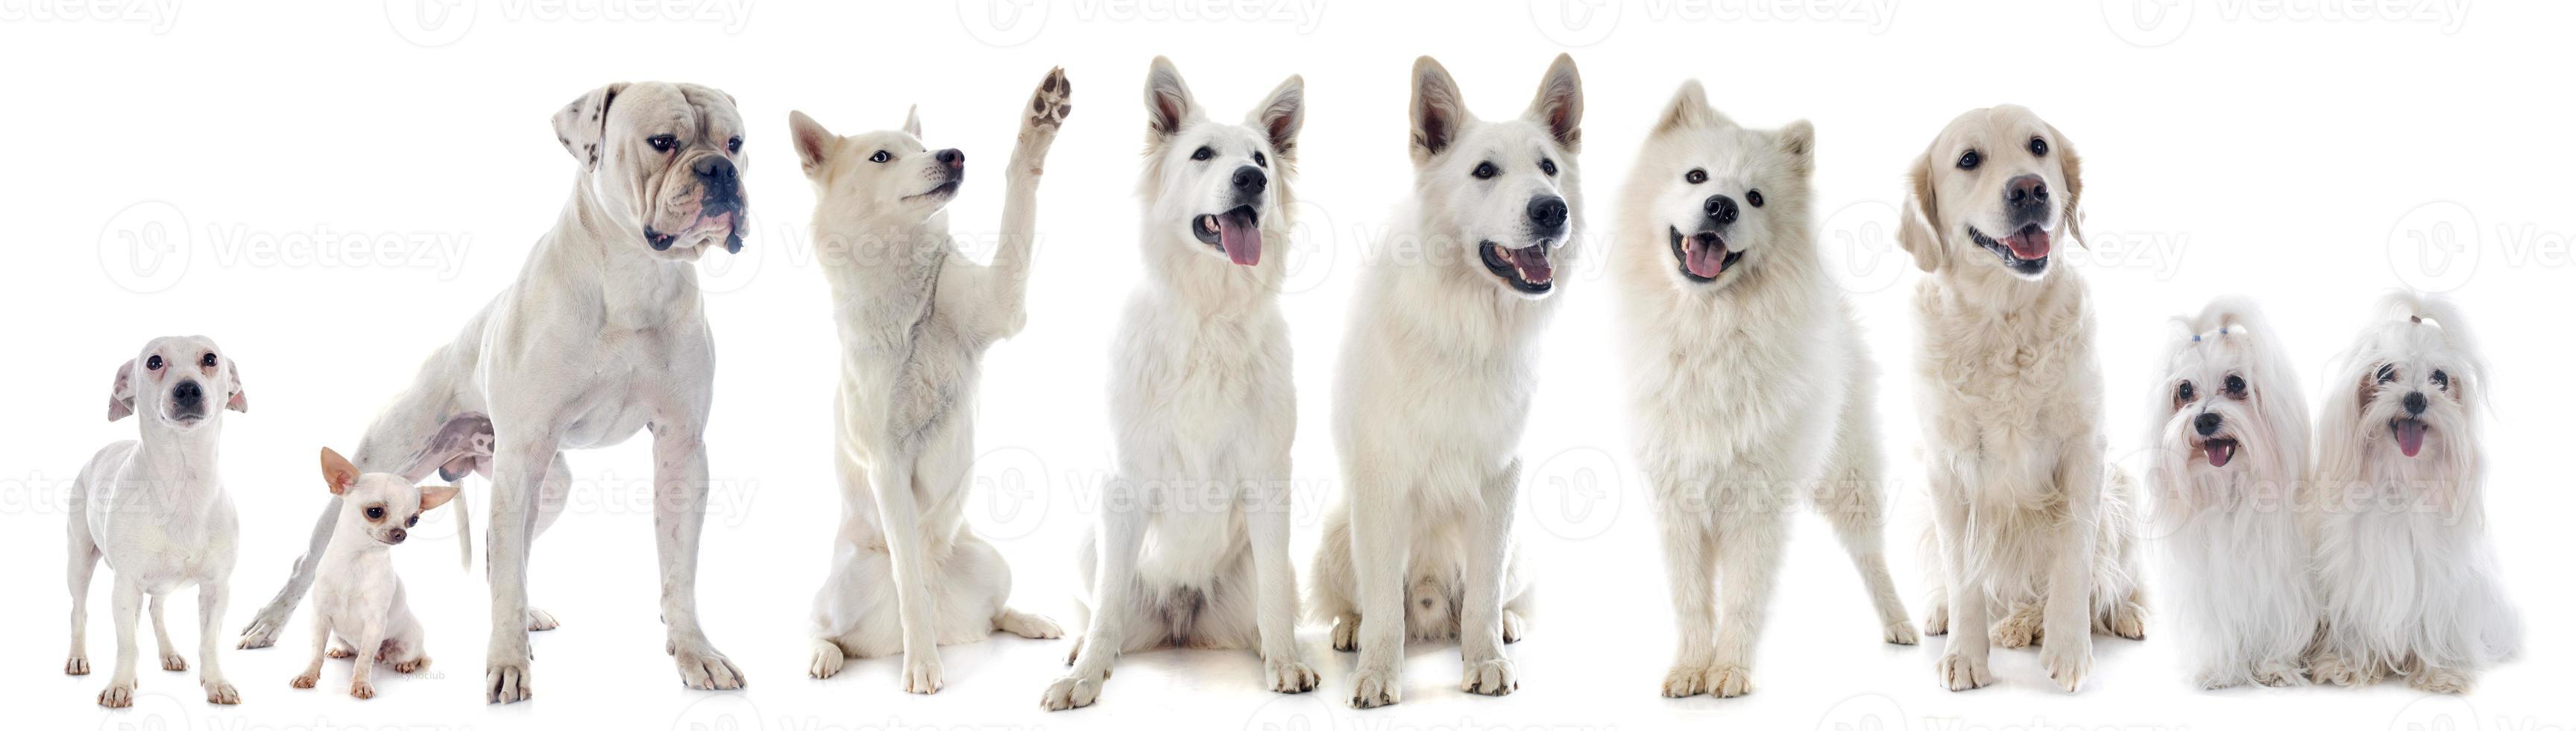 weiße Hunde foto